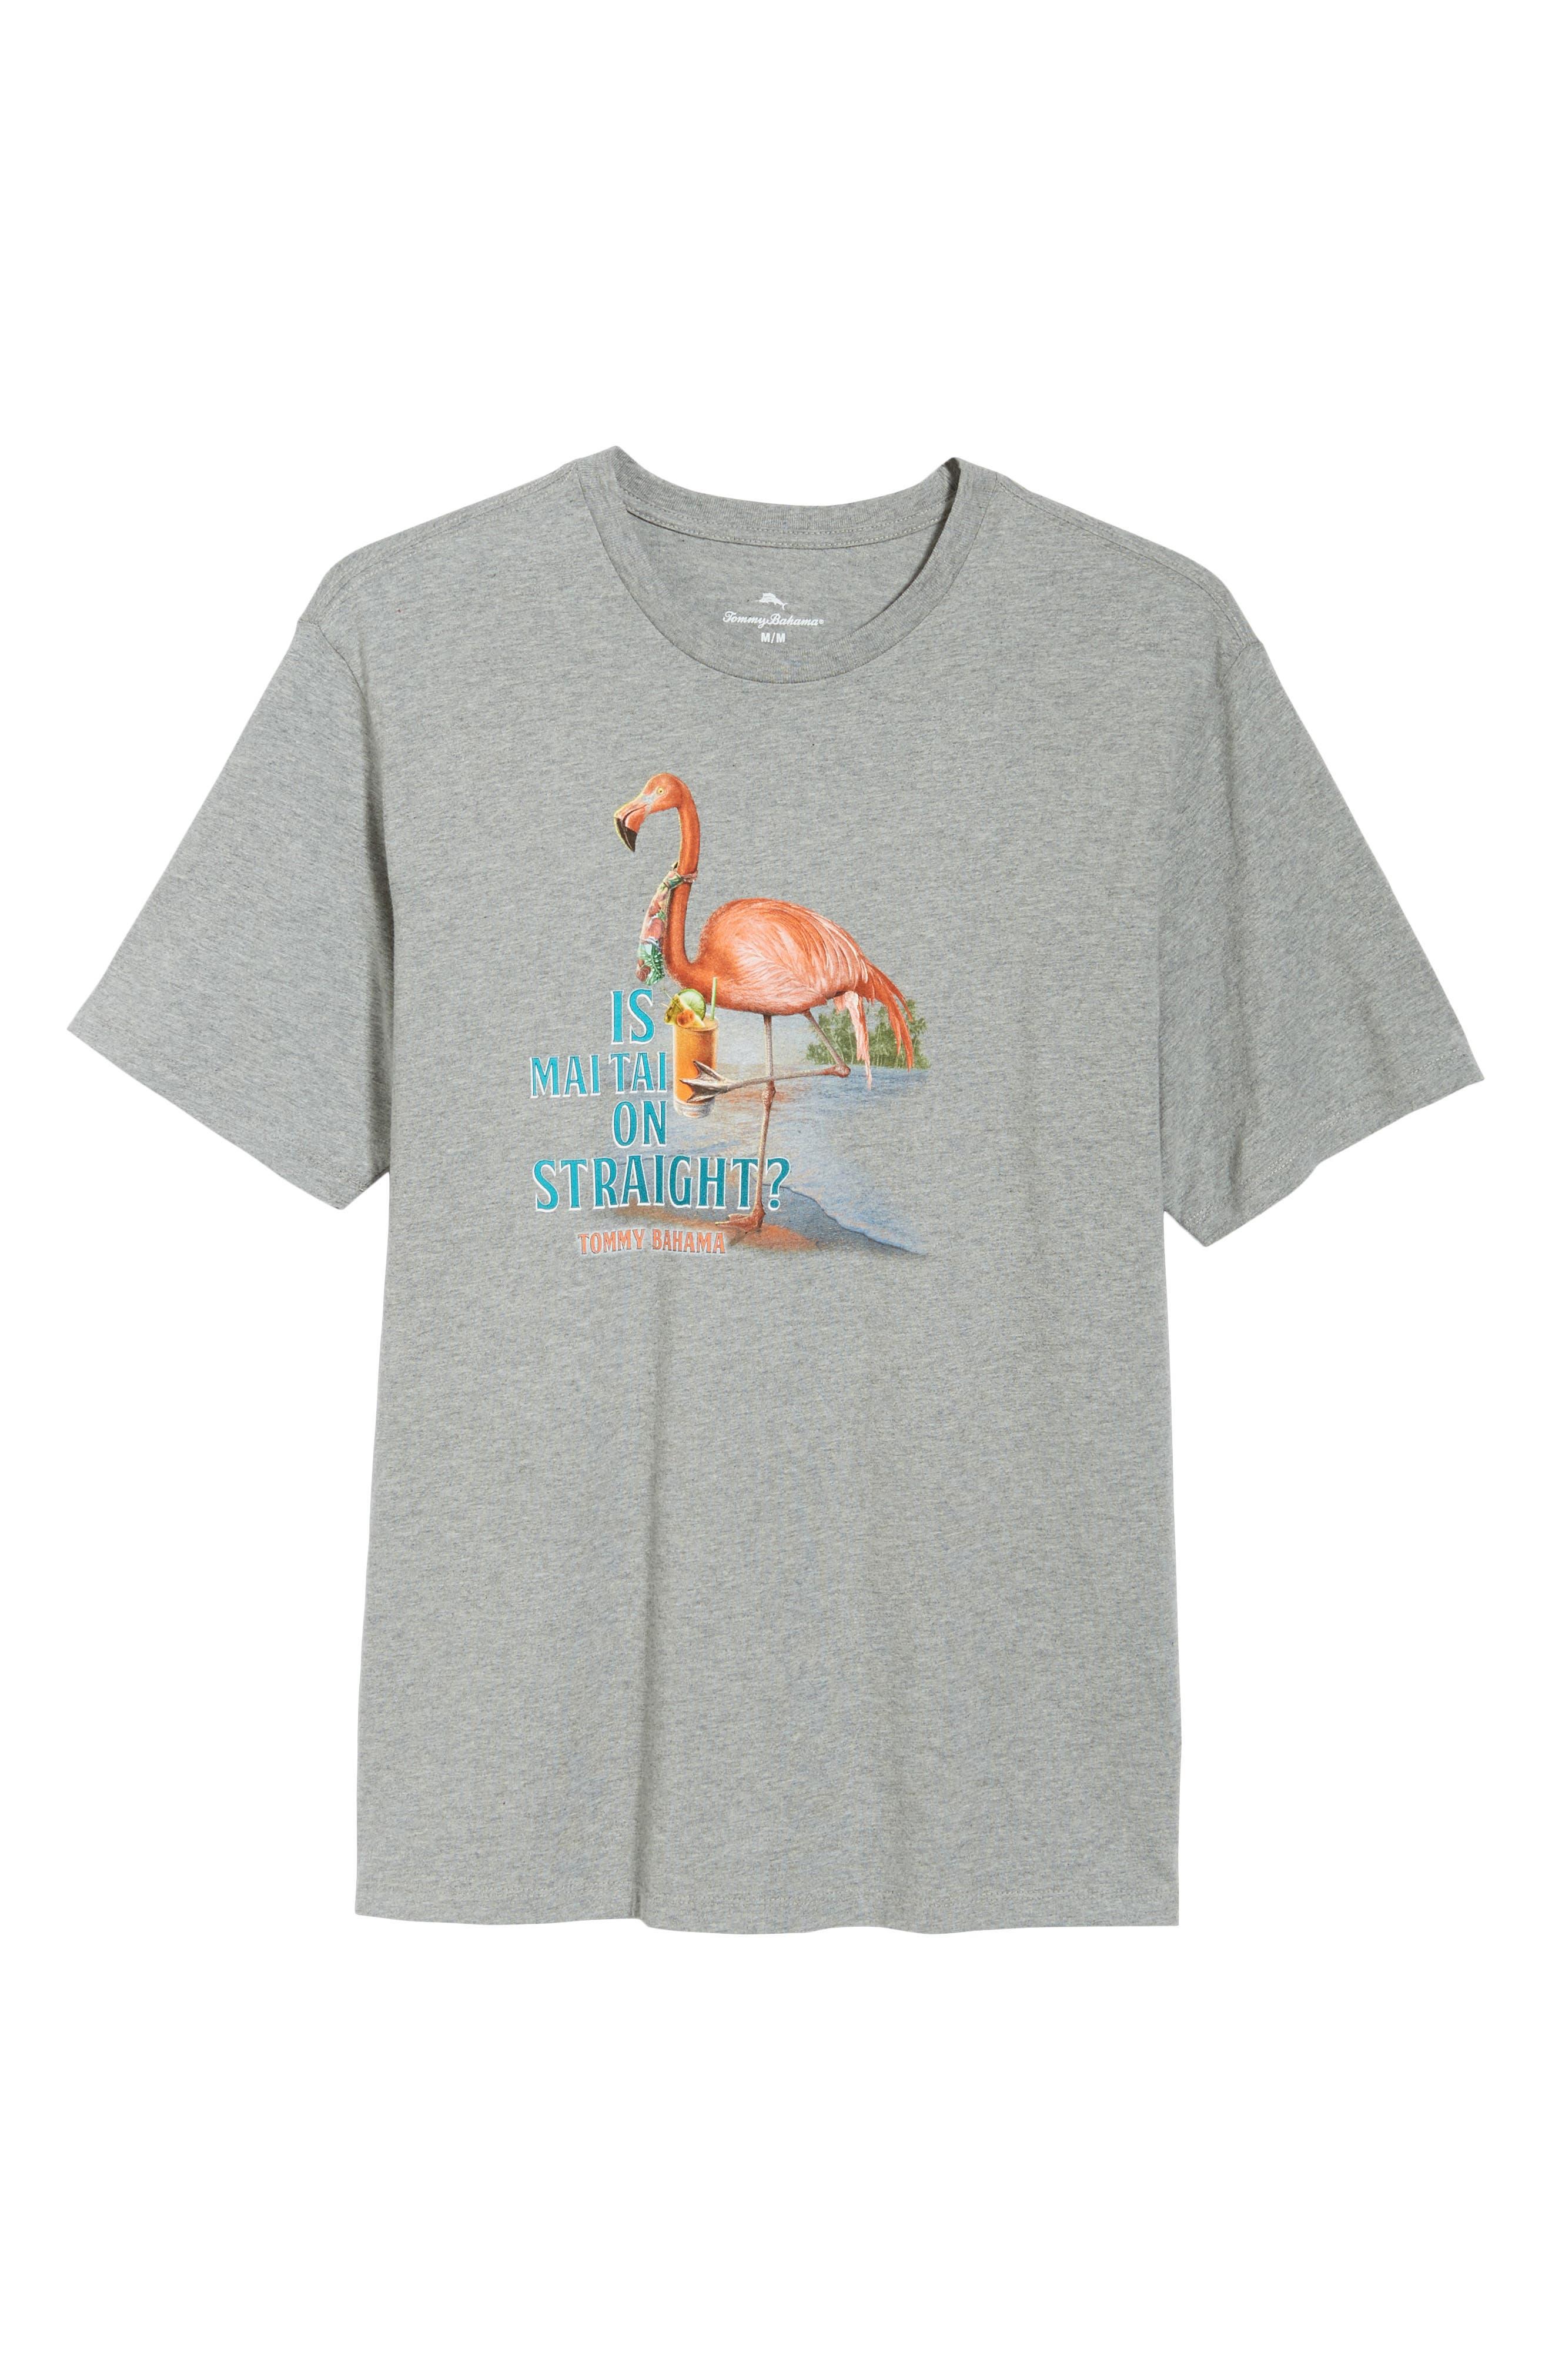 Is Mai Tai on Straight? T-Shirt,                             Alternate thumbnail 6, color,                             GREY HEATHER